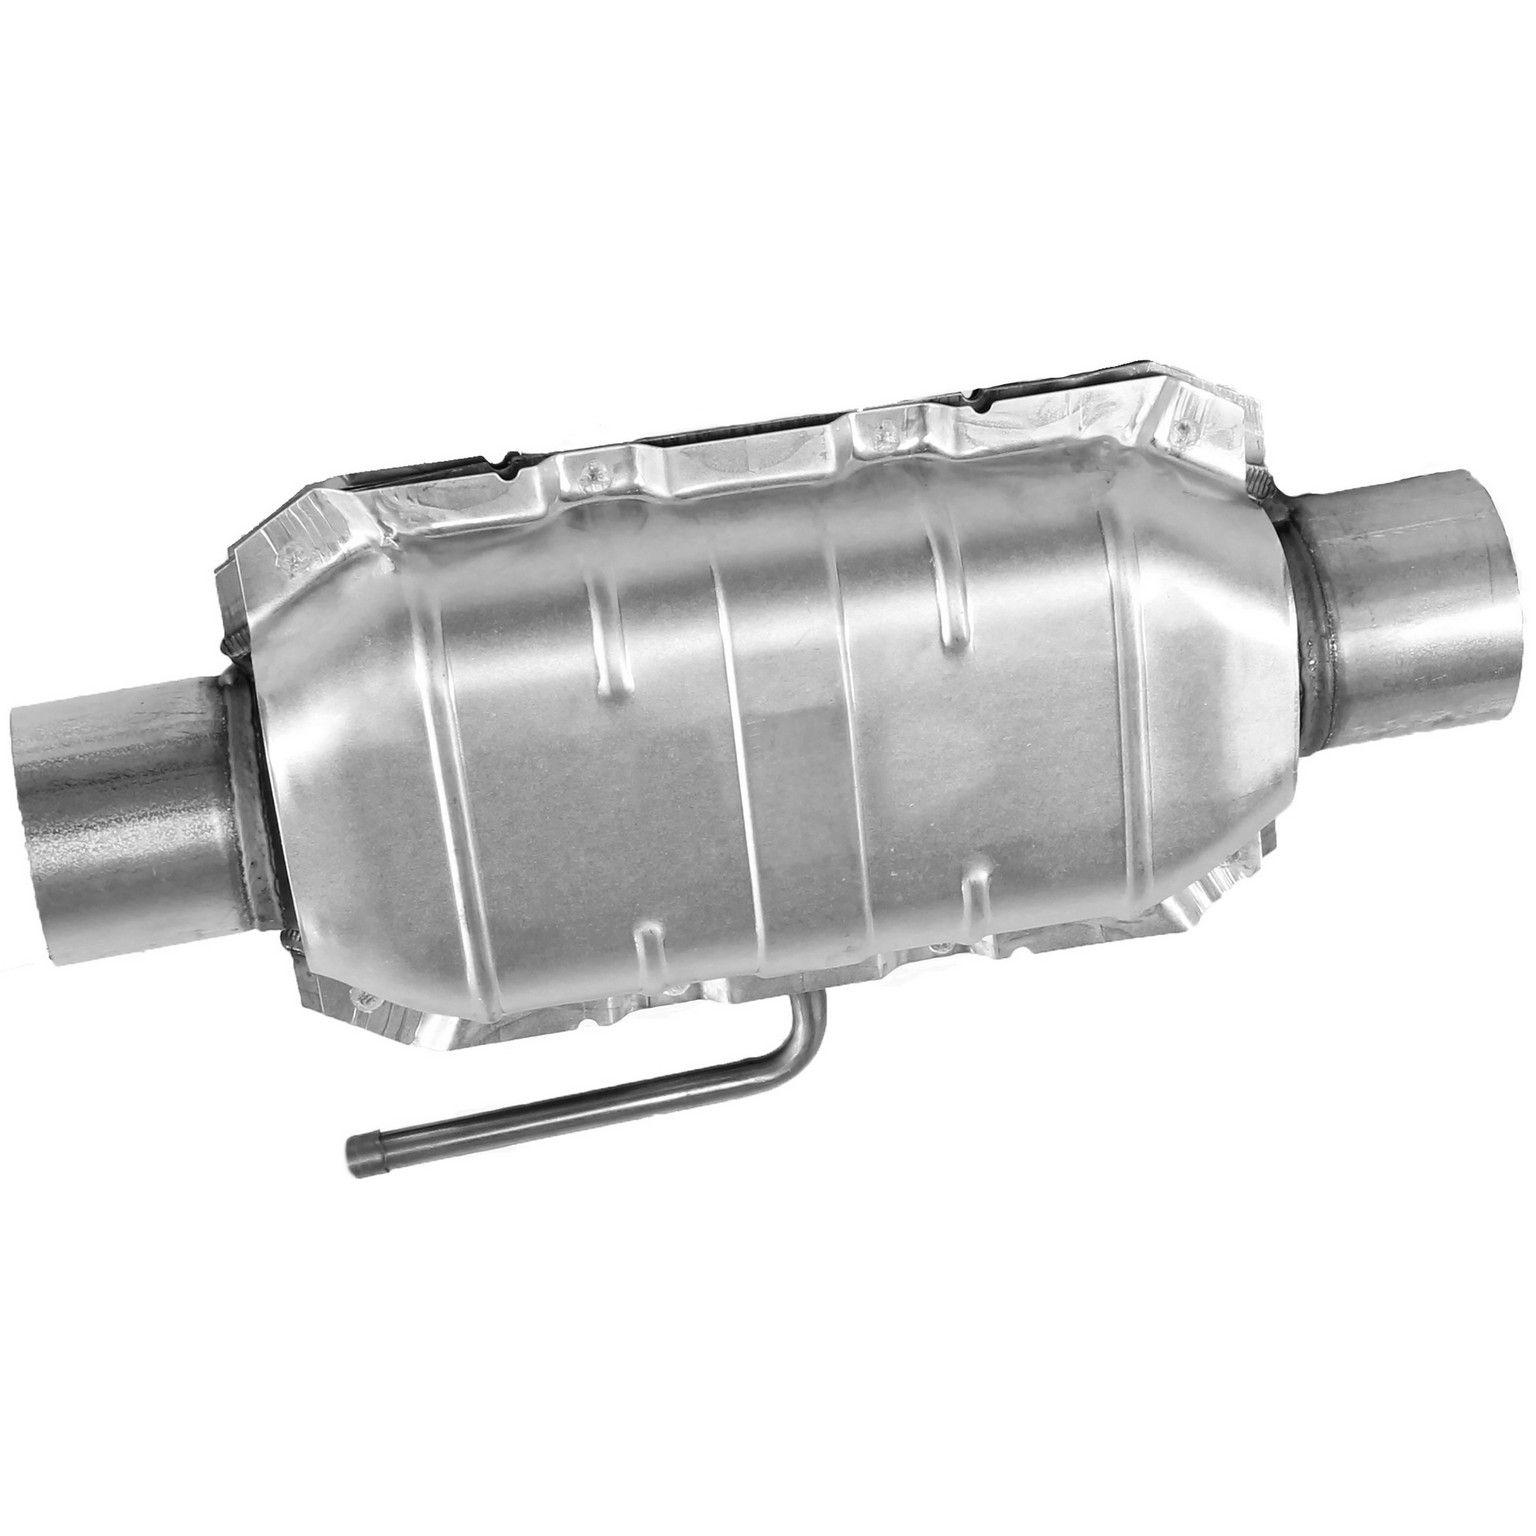 1992 GMC Yukon Catalytic Converter Na 8 Cyl 57l Walker 15043 Fits Fed Calif Emiss Models Not Legal For Sale In The State Of California: 2004 GMC Yukon Catalytic Converter At Woreks.co